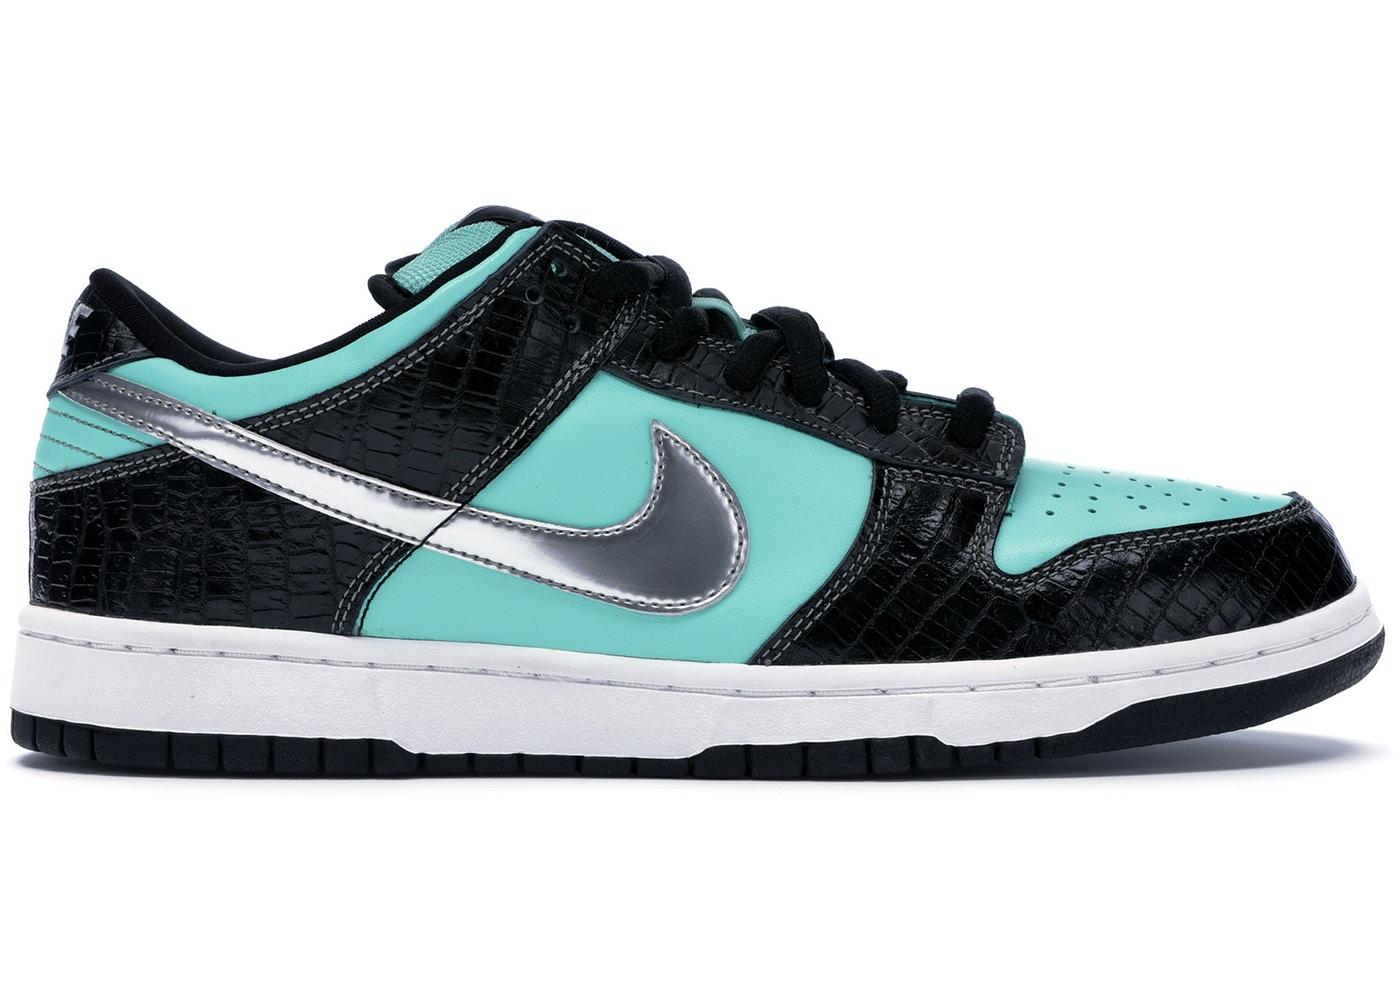 "Nike Dunk SB Low Diamond Supply Co. ""Tiffany"" - 304292-402"